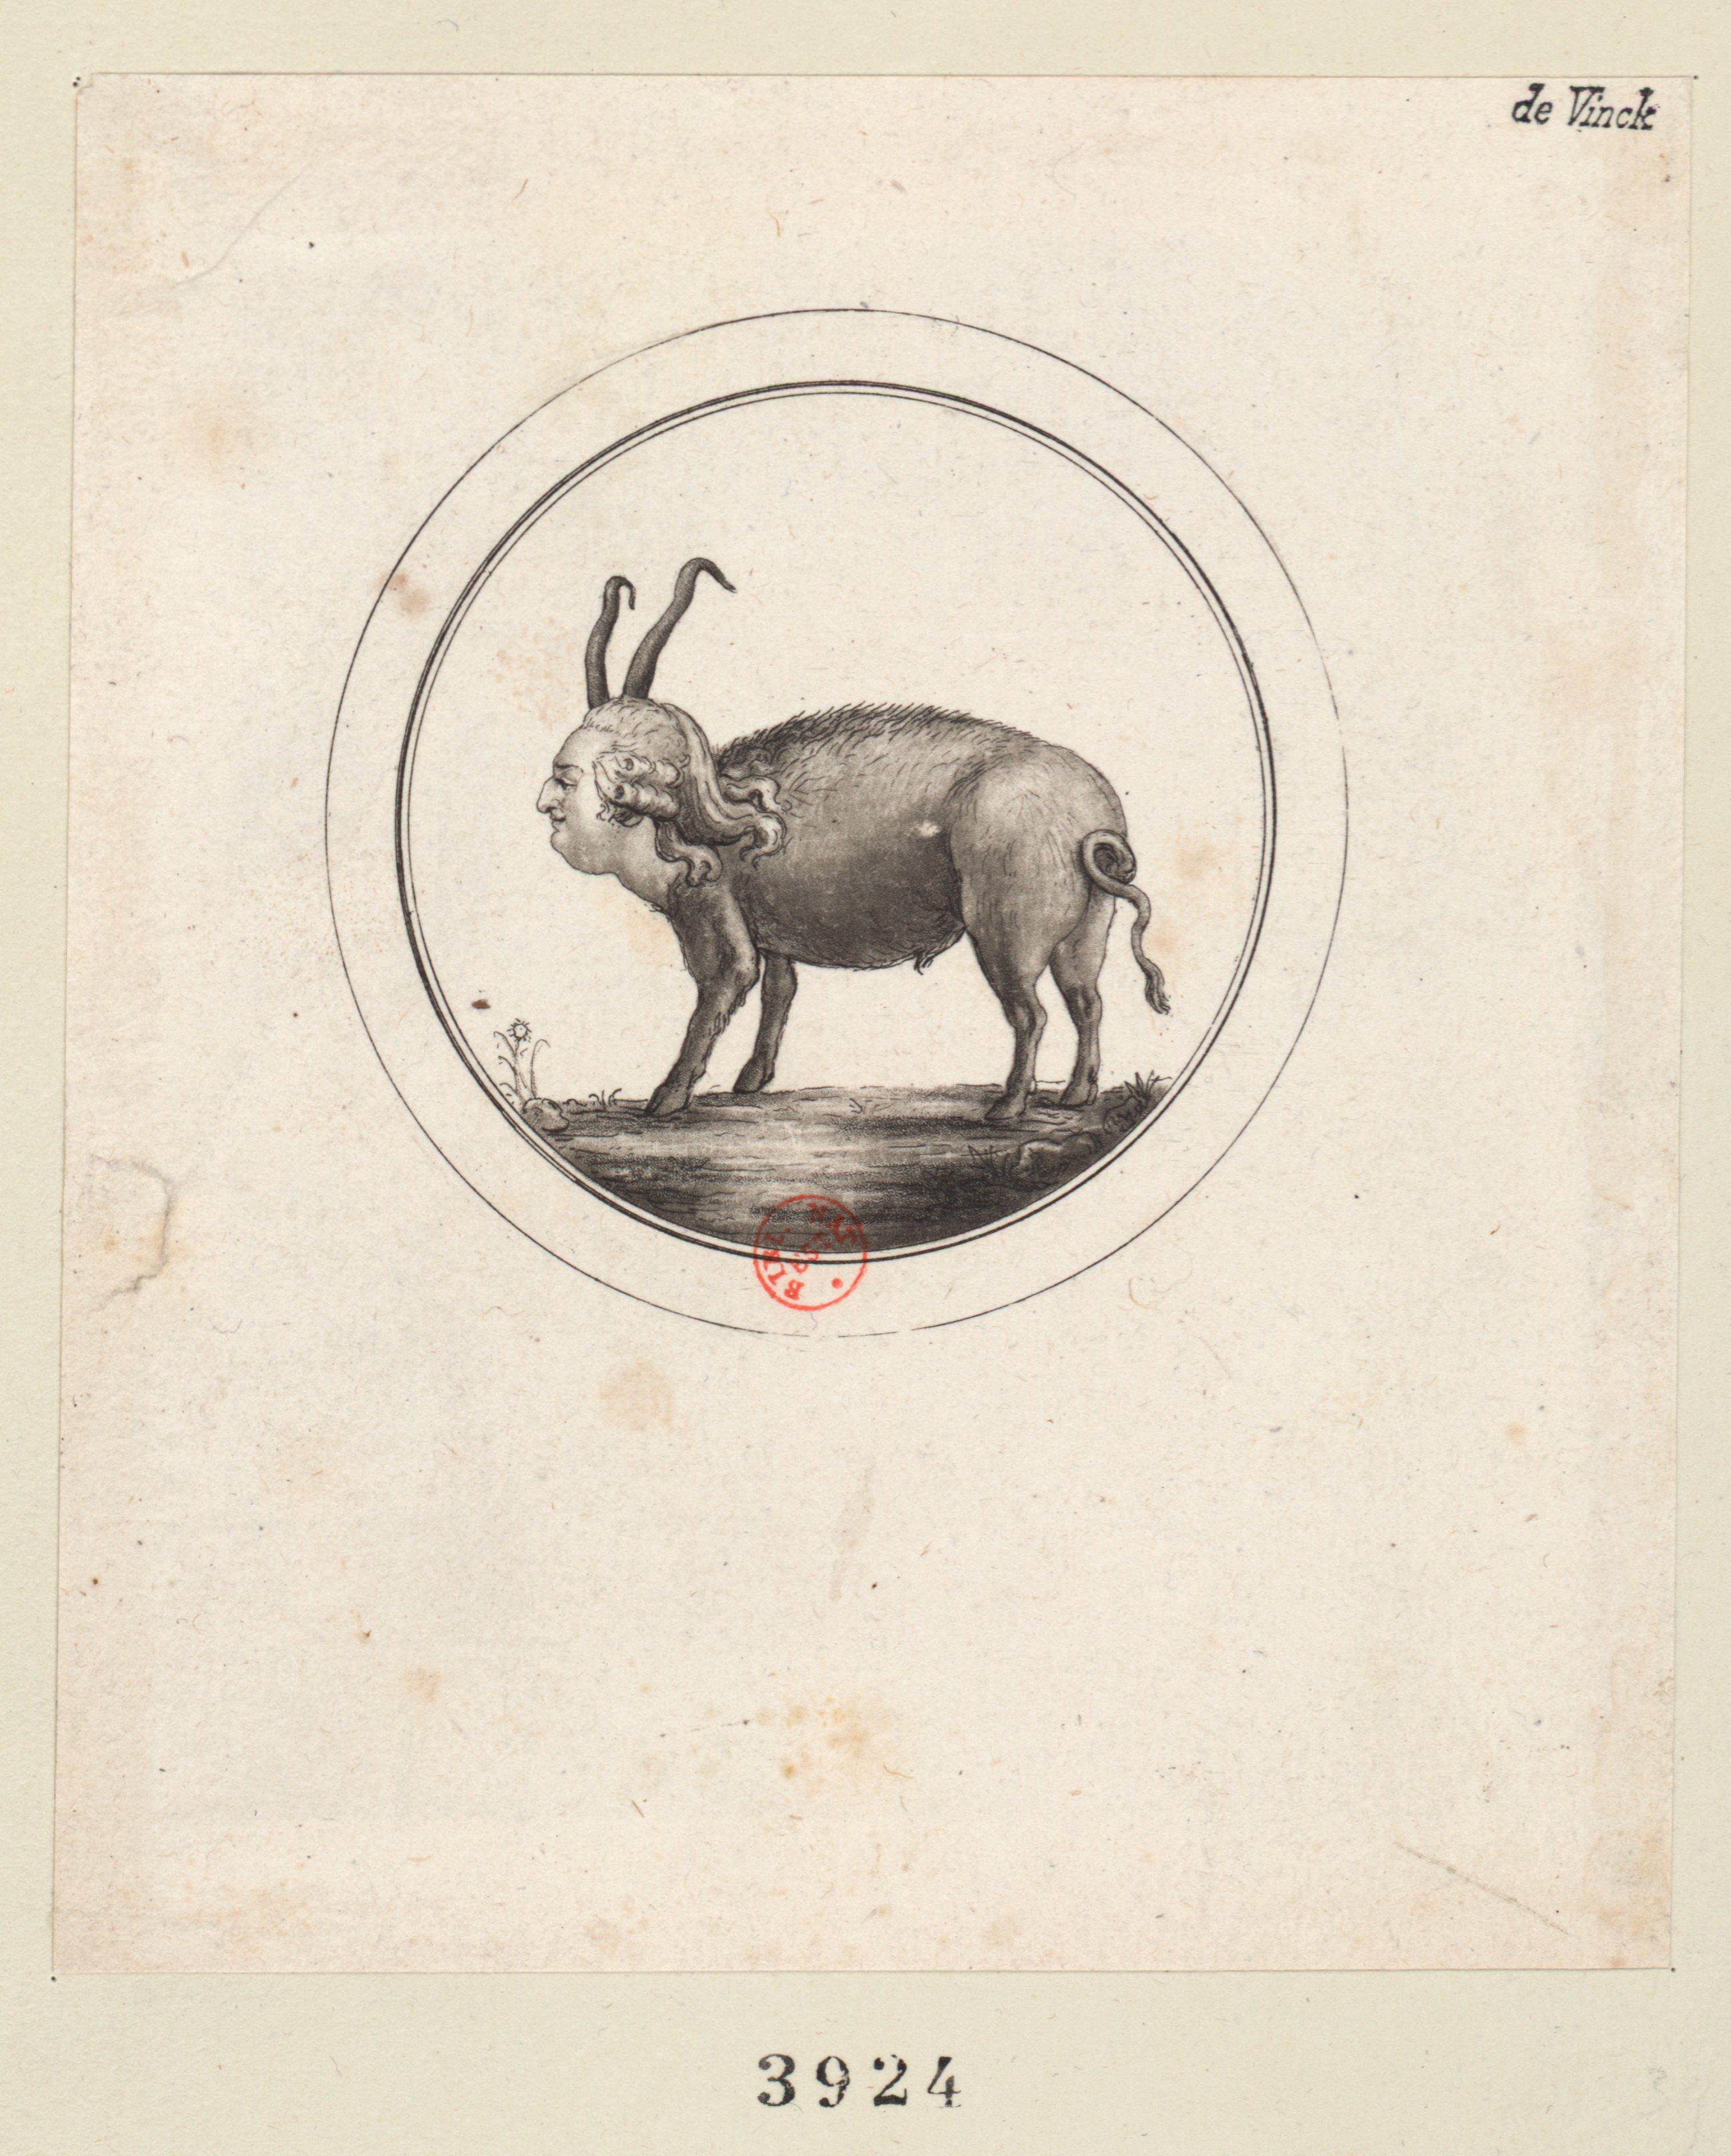 B&W engraving of King Louis XVI as a pig